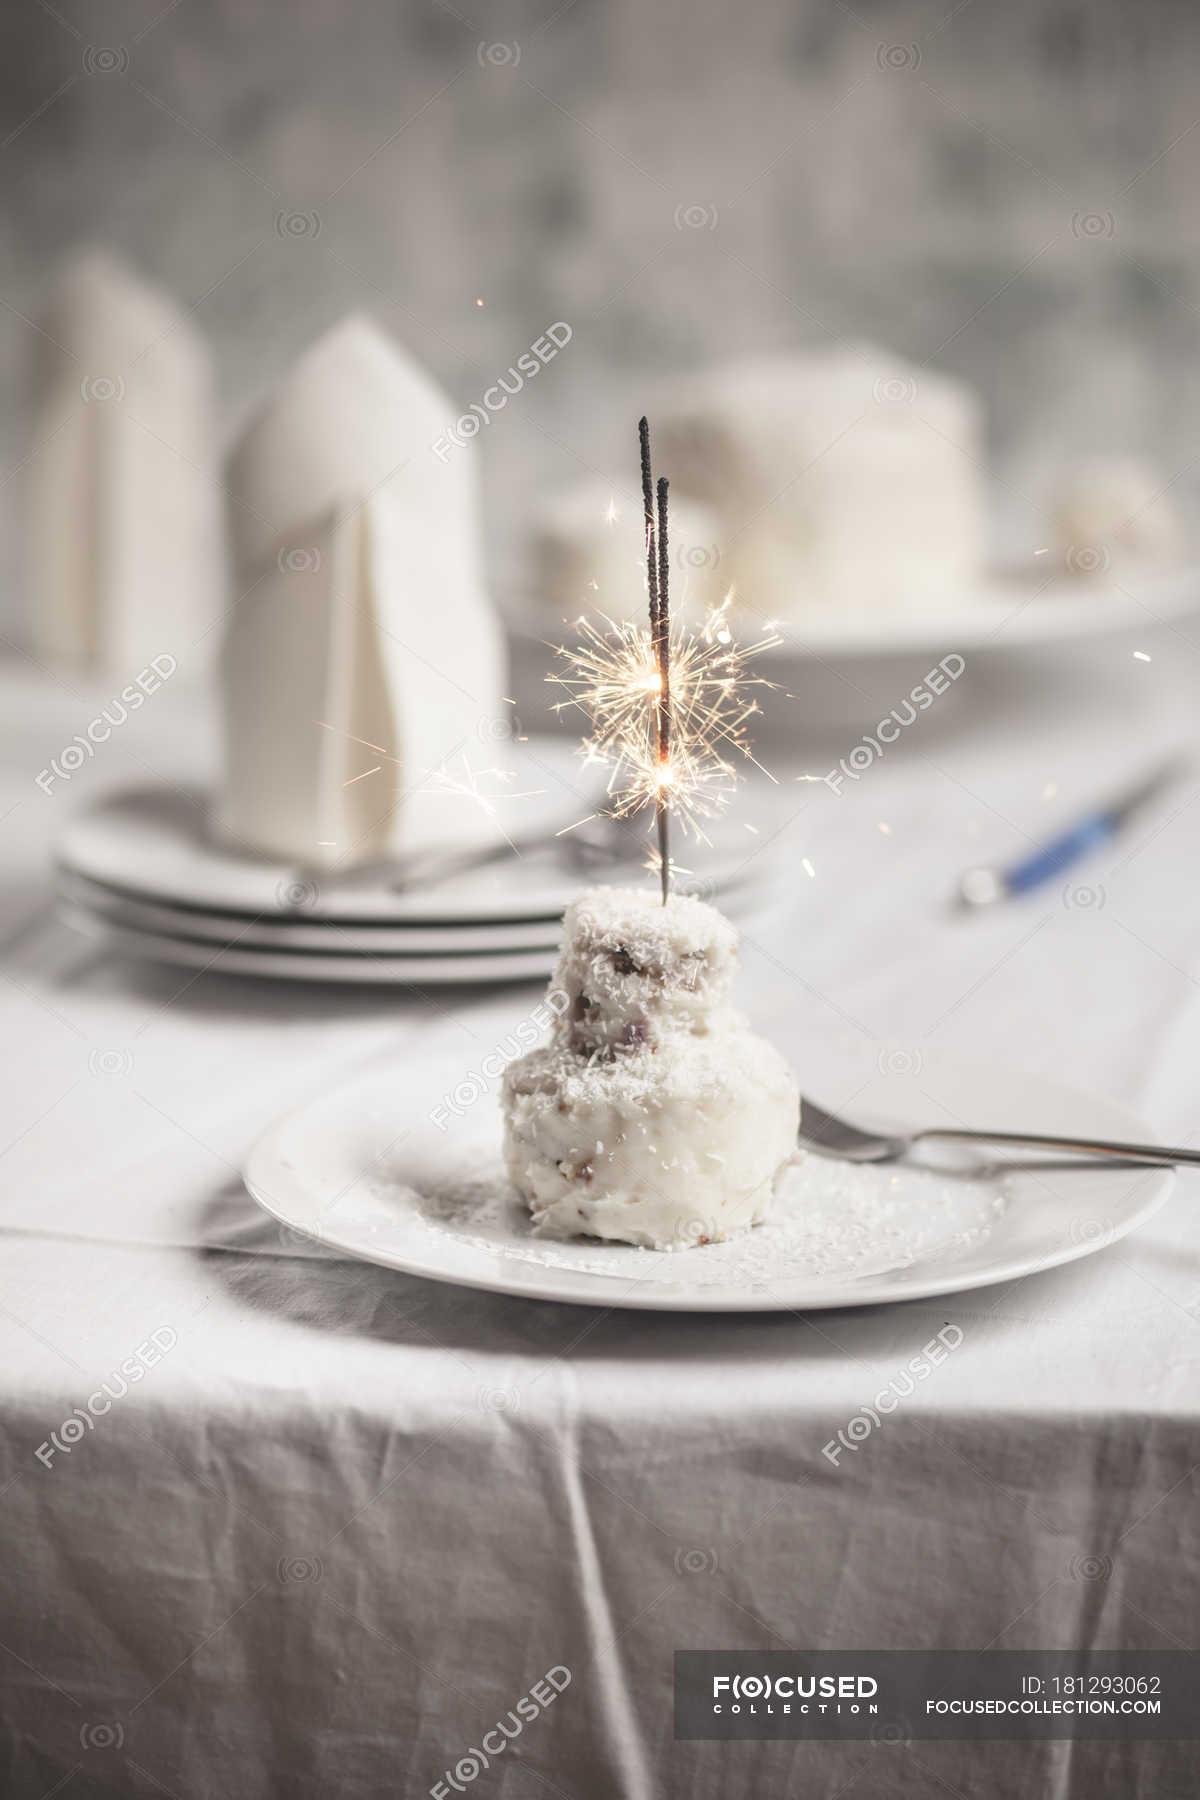 Sensational Mini Coconut Birthday Cake With Sparklers On Plate Knife Fancy Funny Birthday Cards Online Inifodamsfinfo